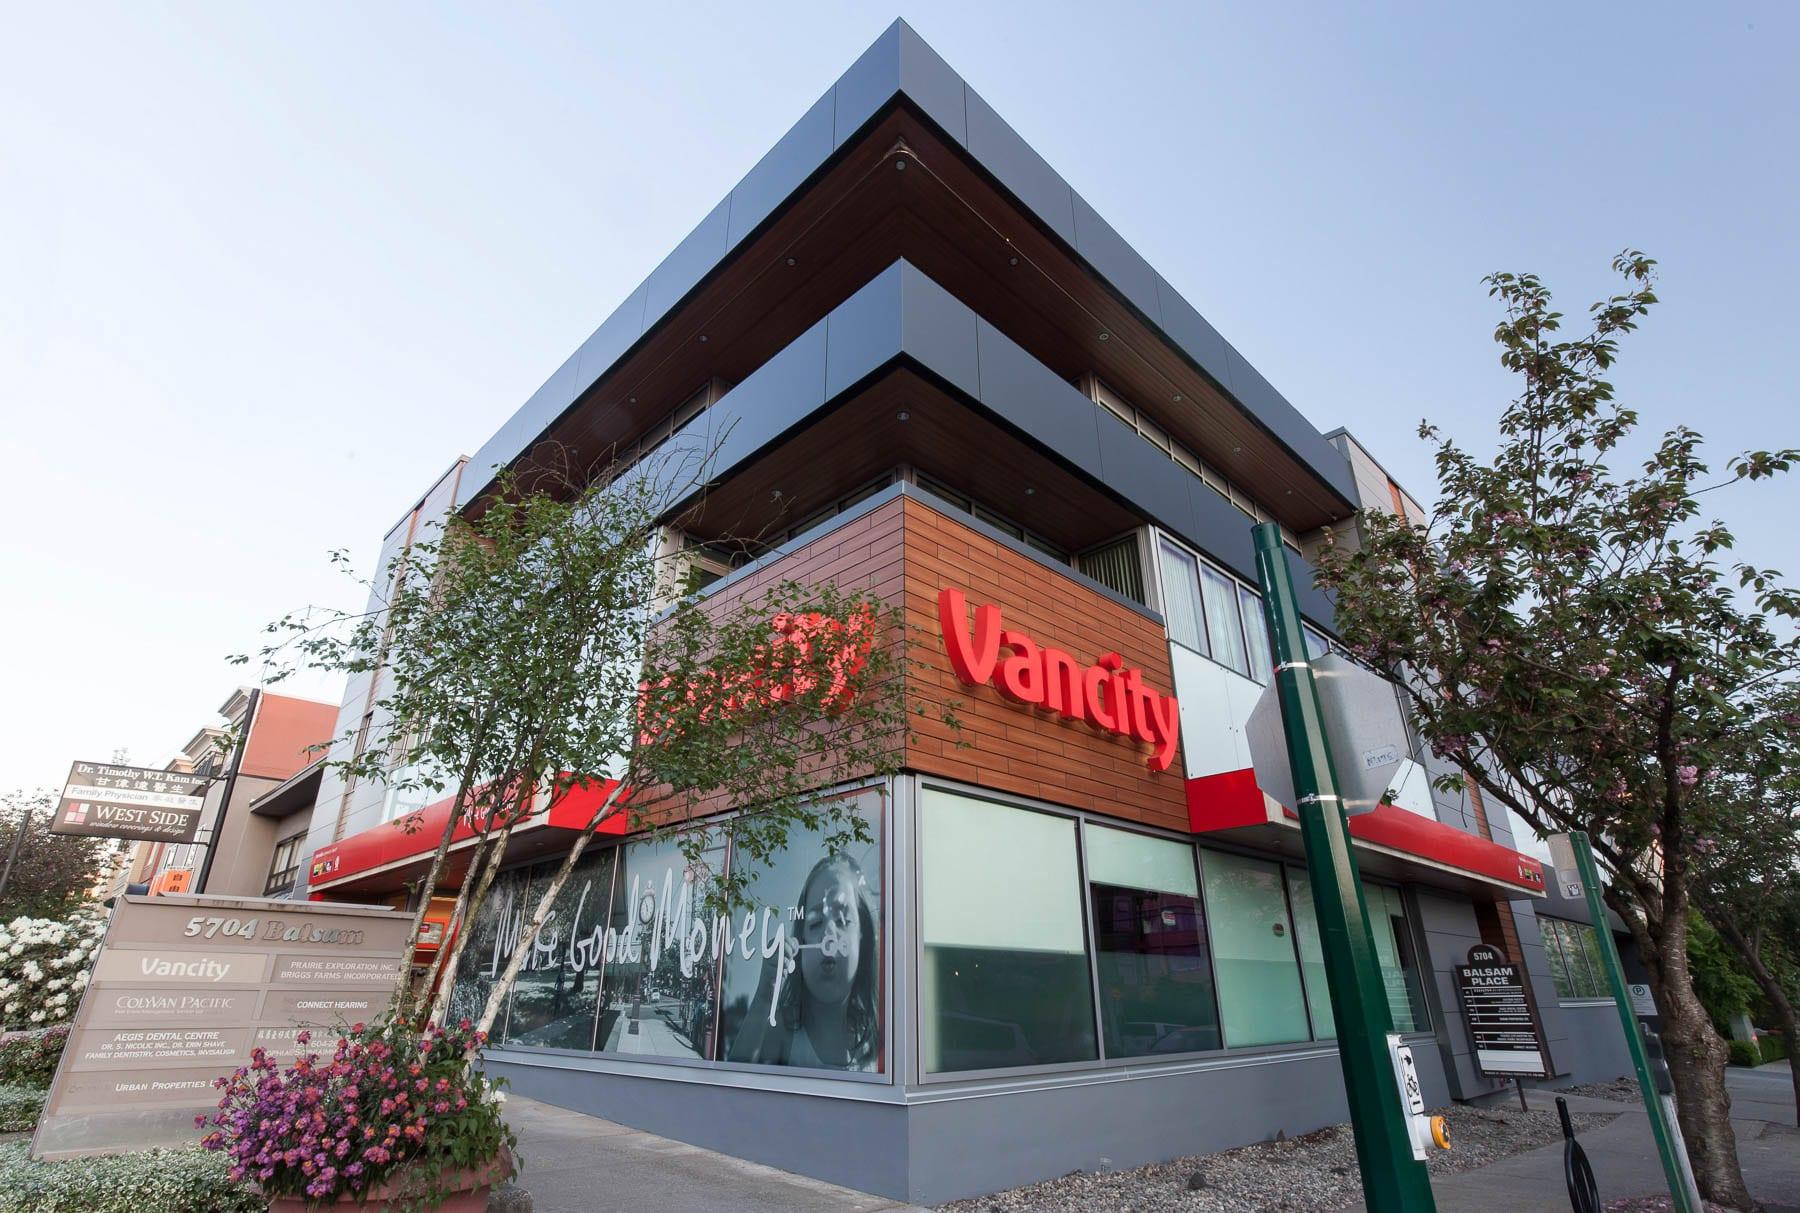 Vancity bank tenant improvement